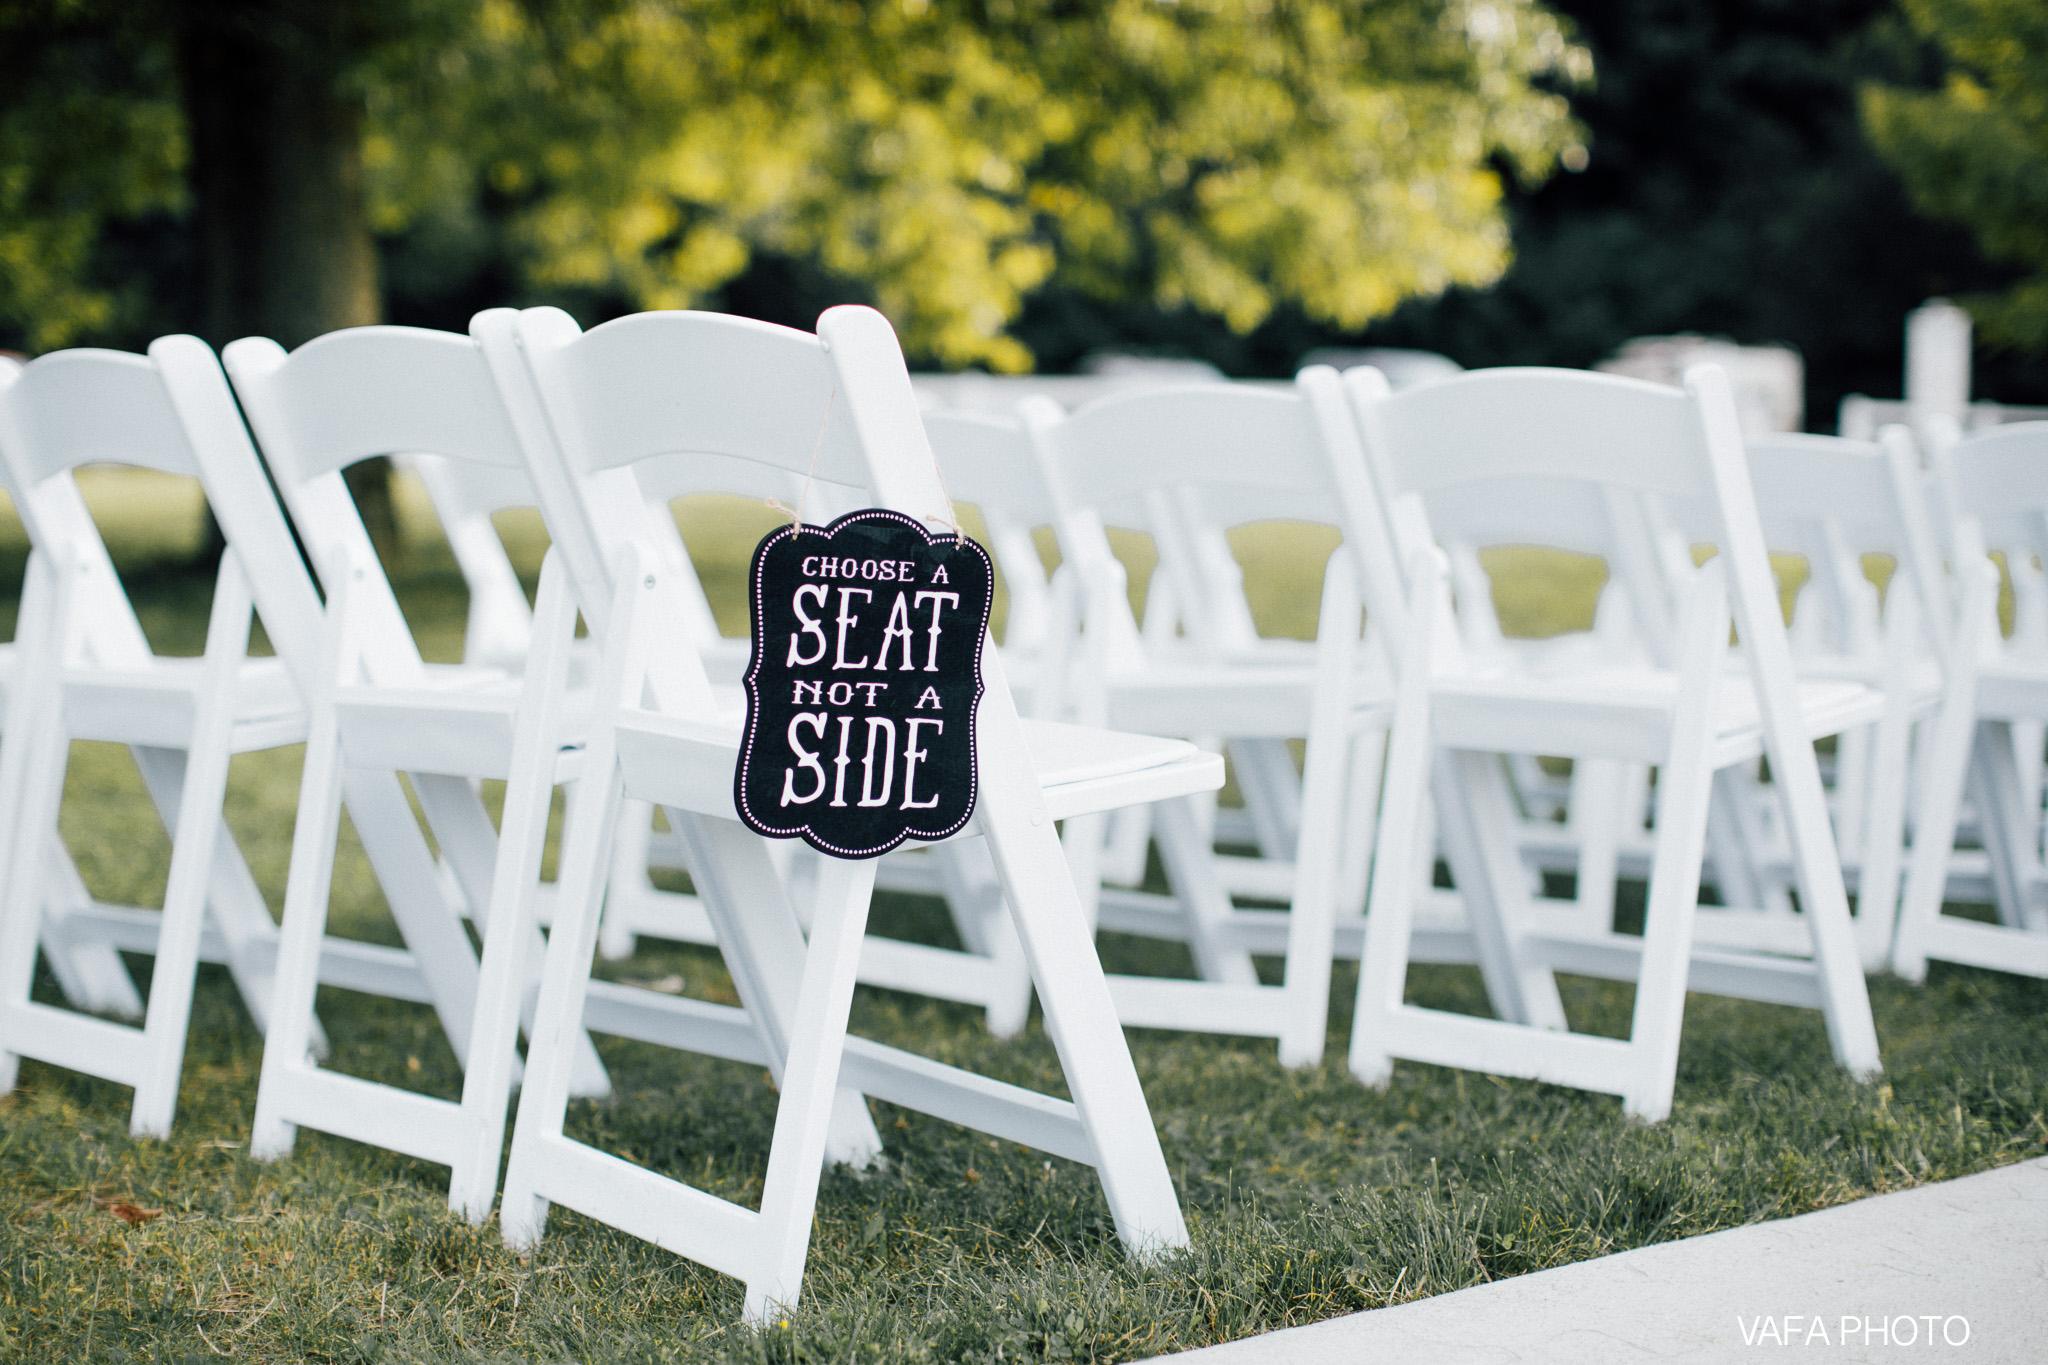 The-Felt-Estate-Wedding-Kailie-David-Vafa-Photo-229.jpg